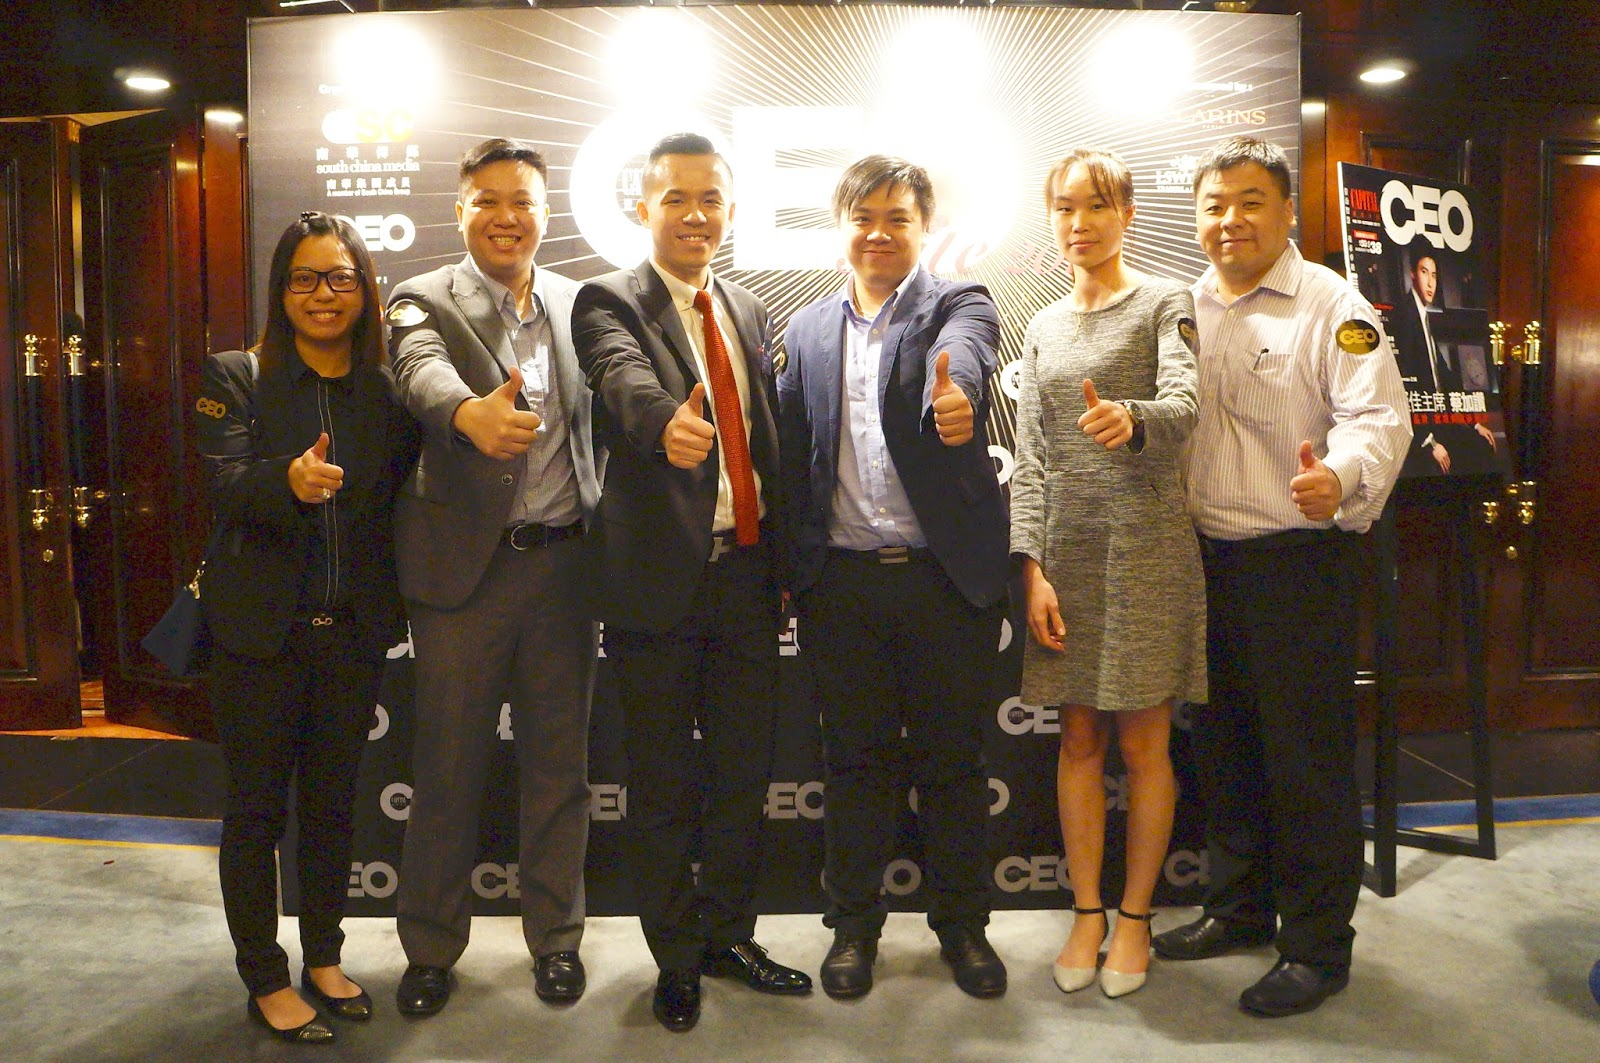 儲存易迷你倉集團 Storefriendly Self Storage Group Blog [No.1 Self Storage in Asia]: 2015/6/1 - 2015/7/1